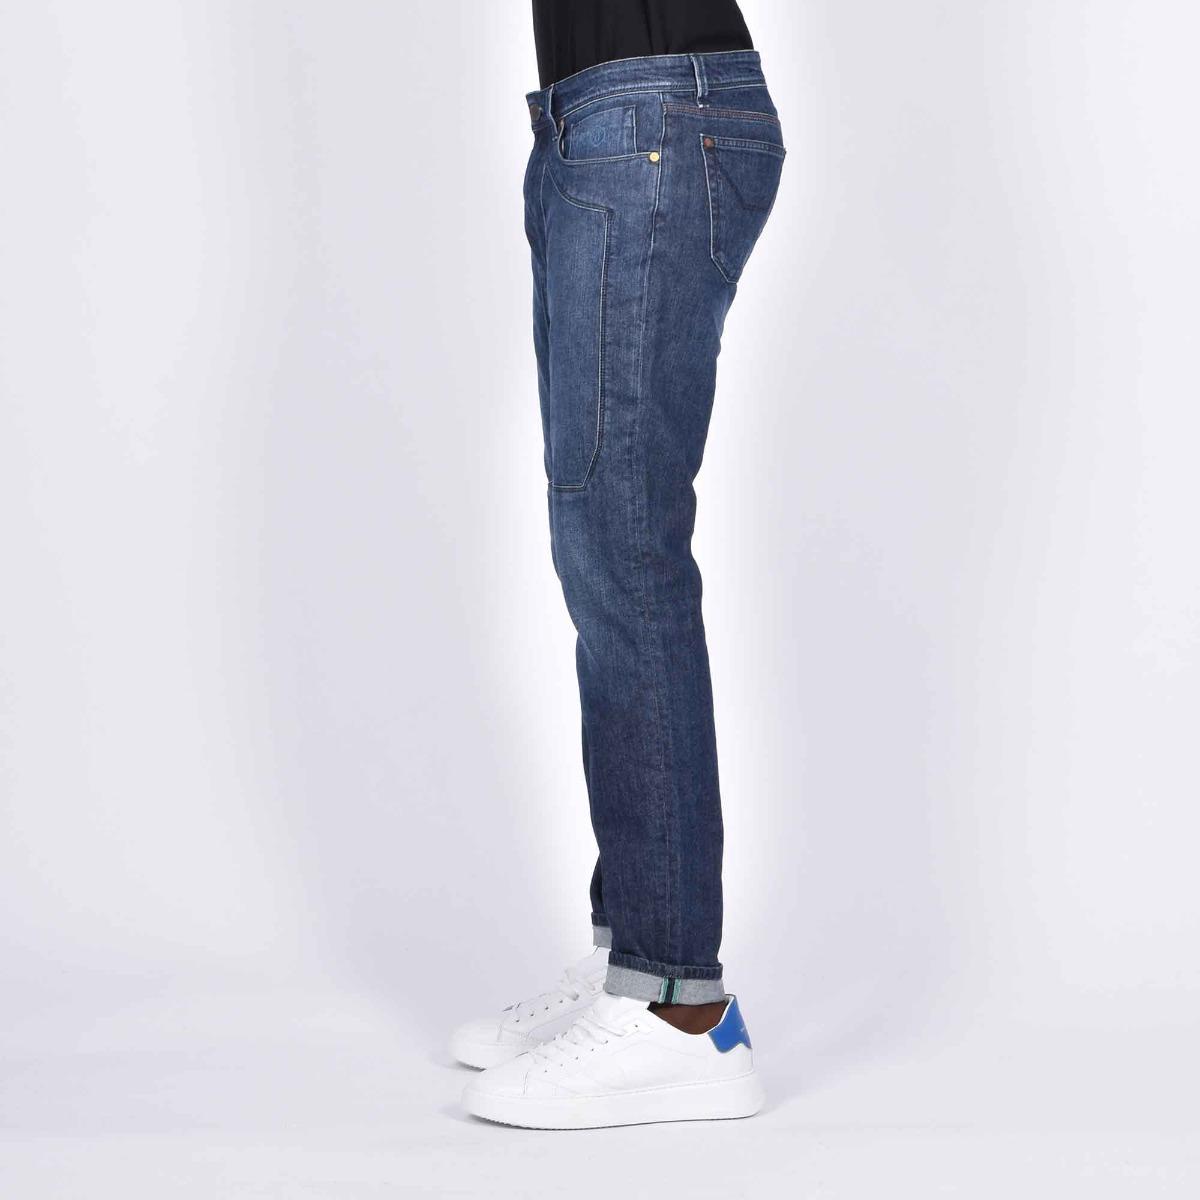 Jeans toppe in tono- Denim medio